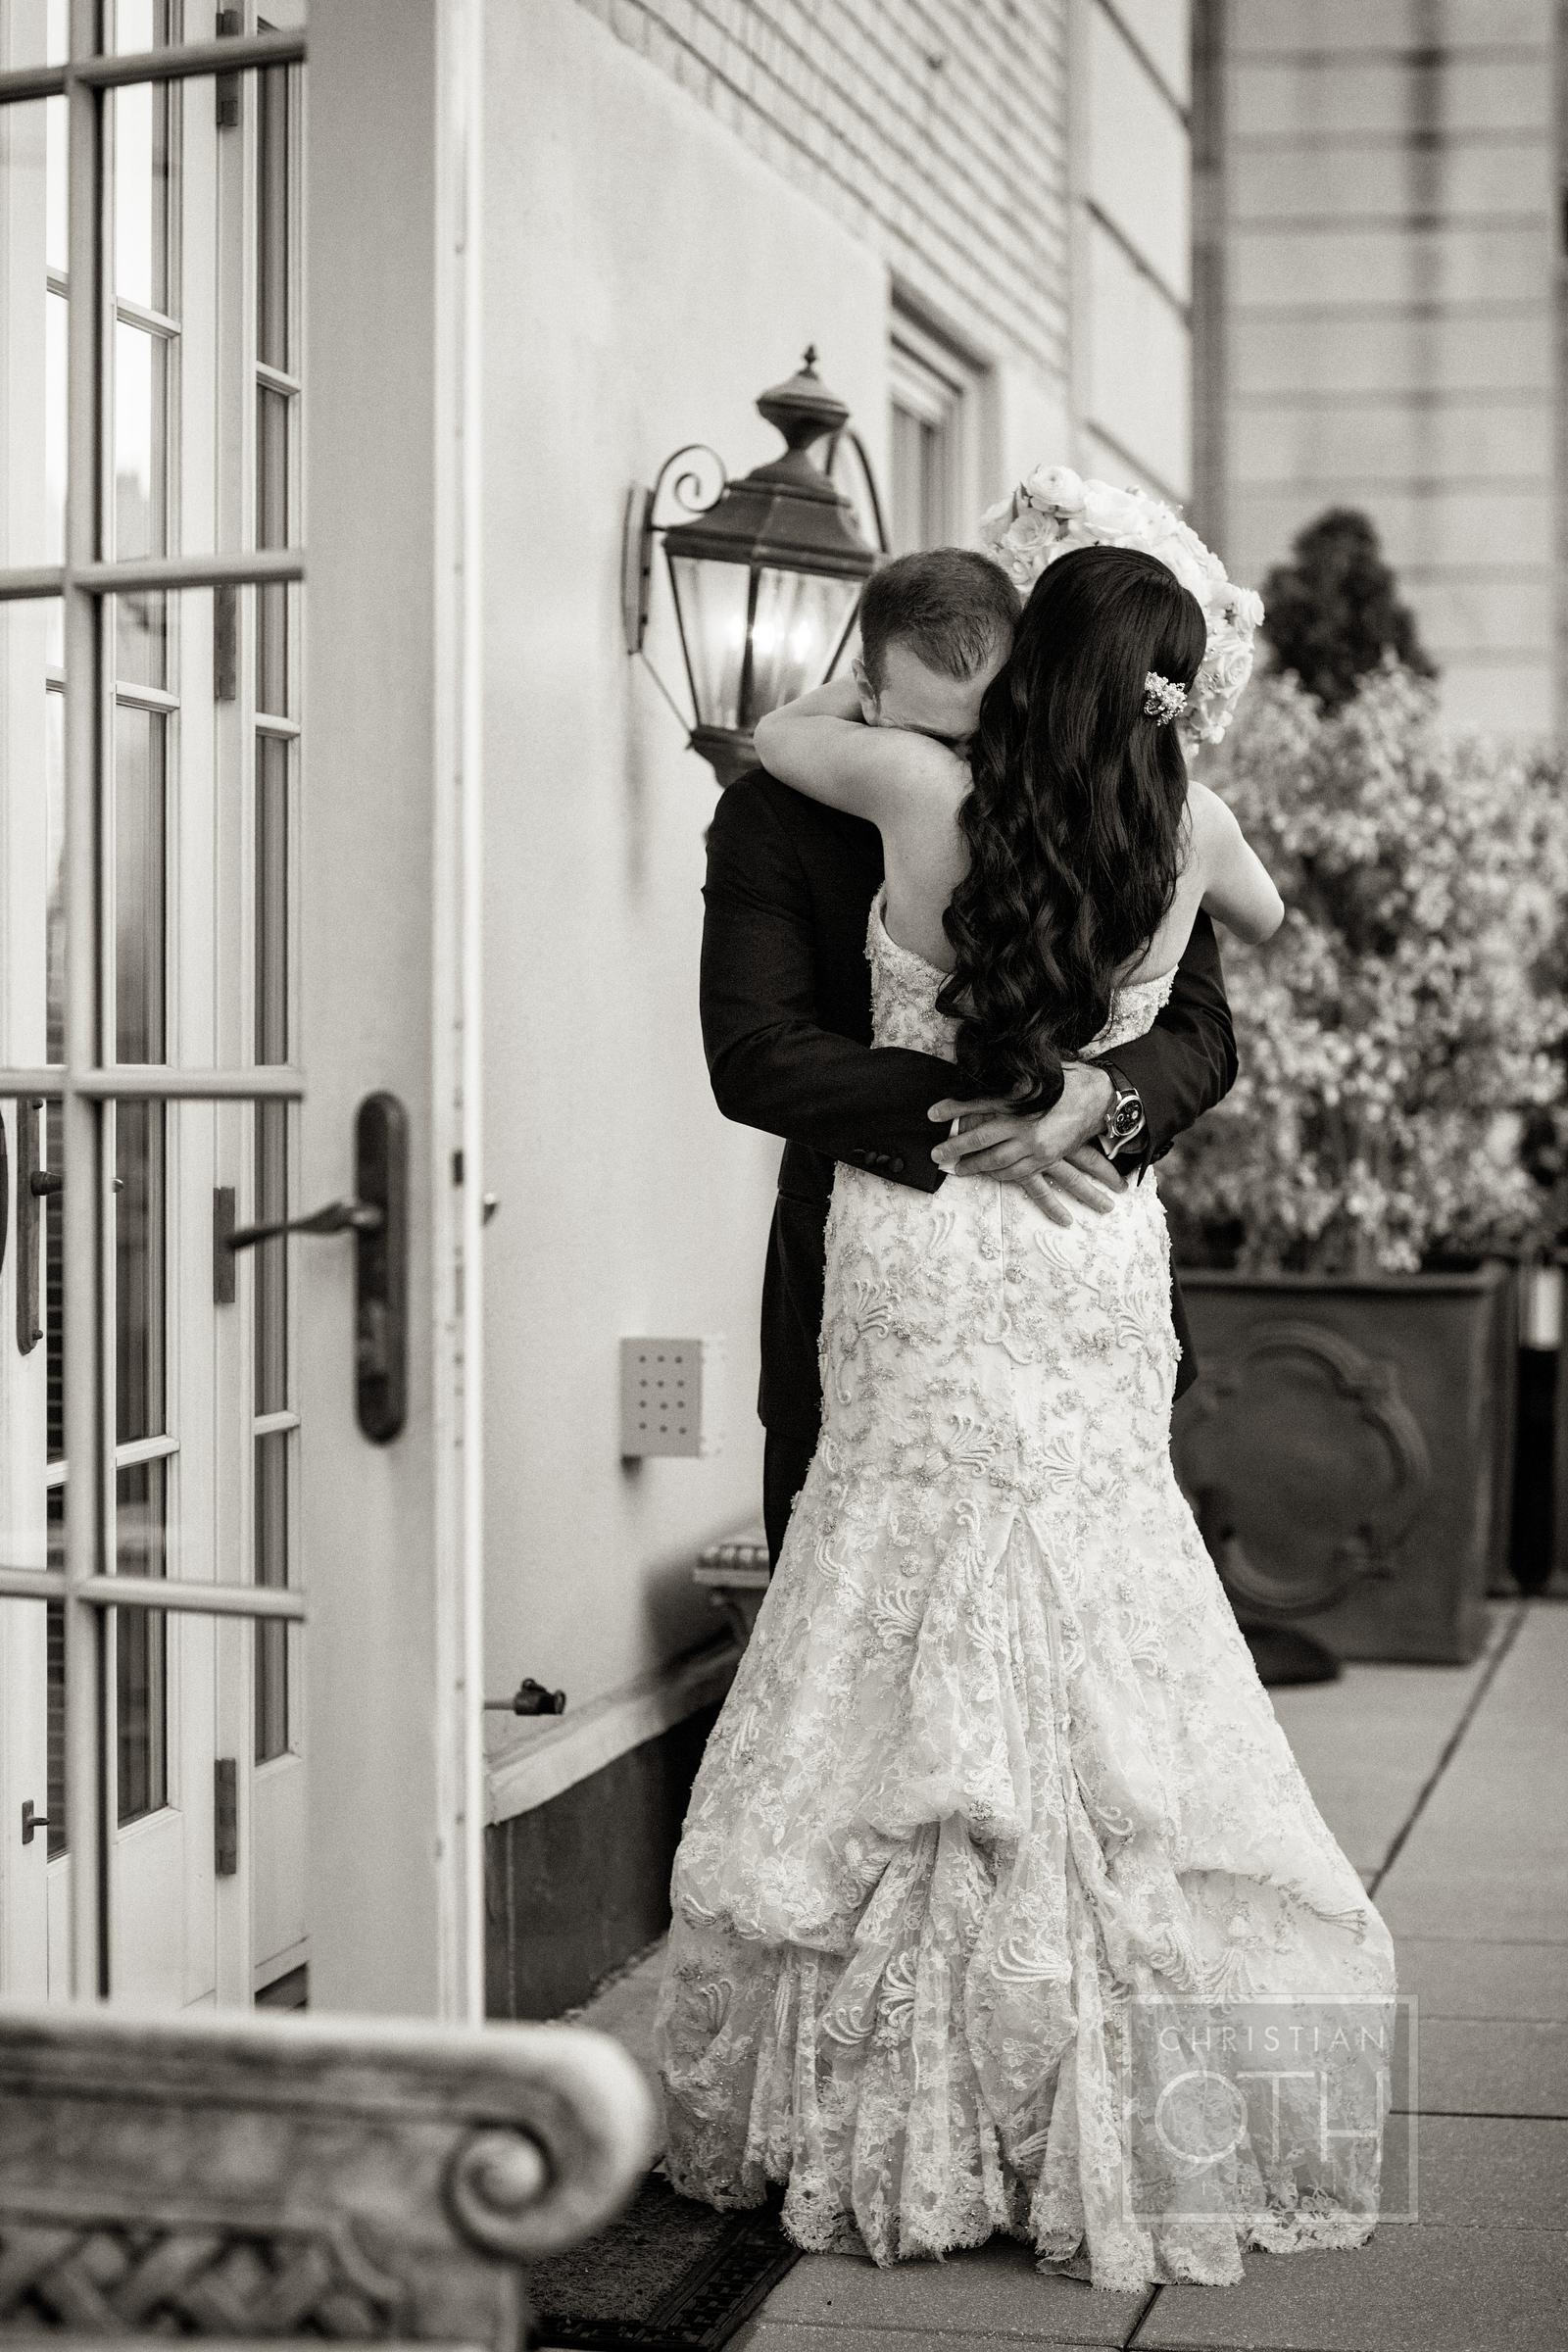 Ceci_New_York_Custom_Invitation_Pierre__City_ Destination_Wedding_Luxury_Personalized_Ceci_Style_Bride_Rose_Gold_Foil_Stamping41.JPG